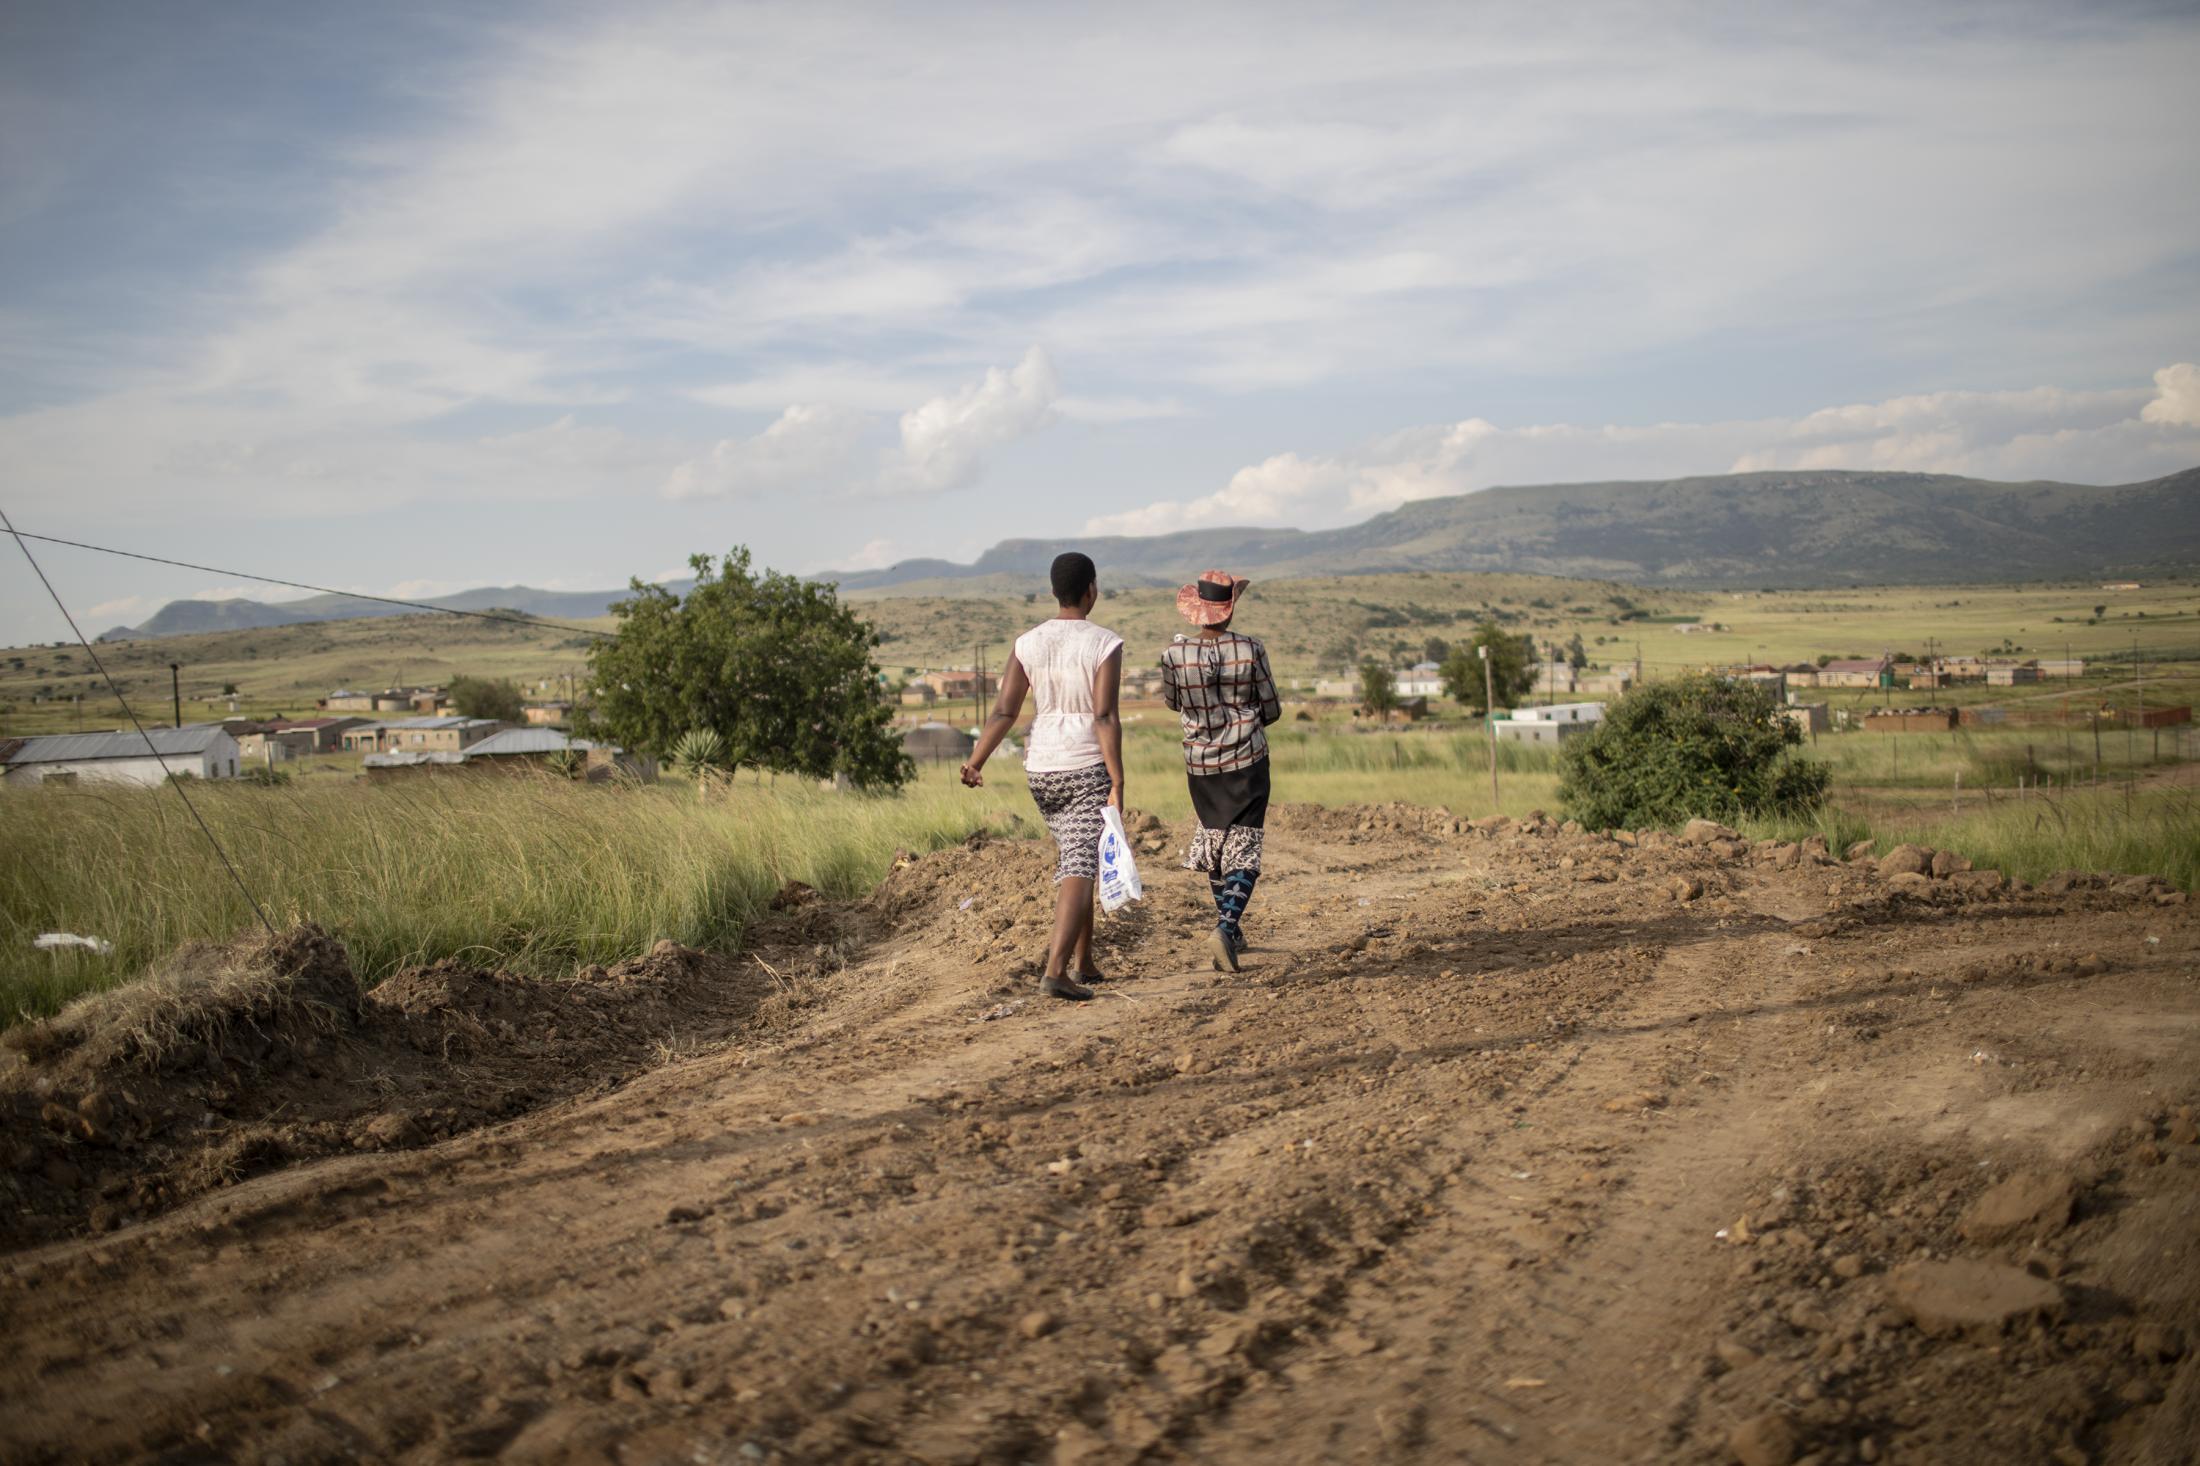 17 February 2020: Women walk on the roads close to the Vilakazi home in Watersmeet, Ladysmith, Kwa-Zulu Natal.